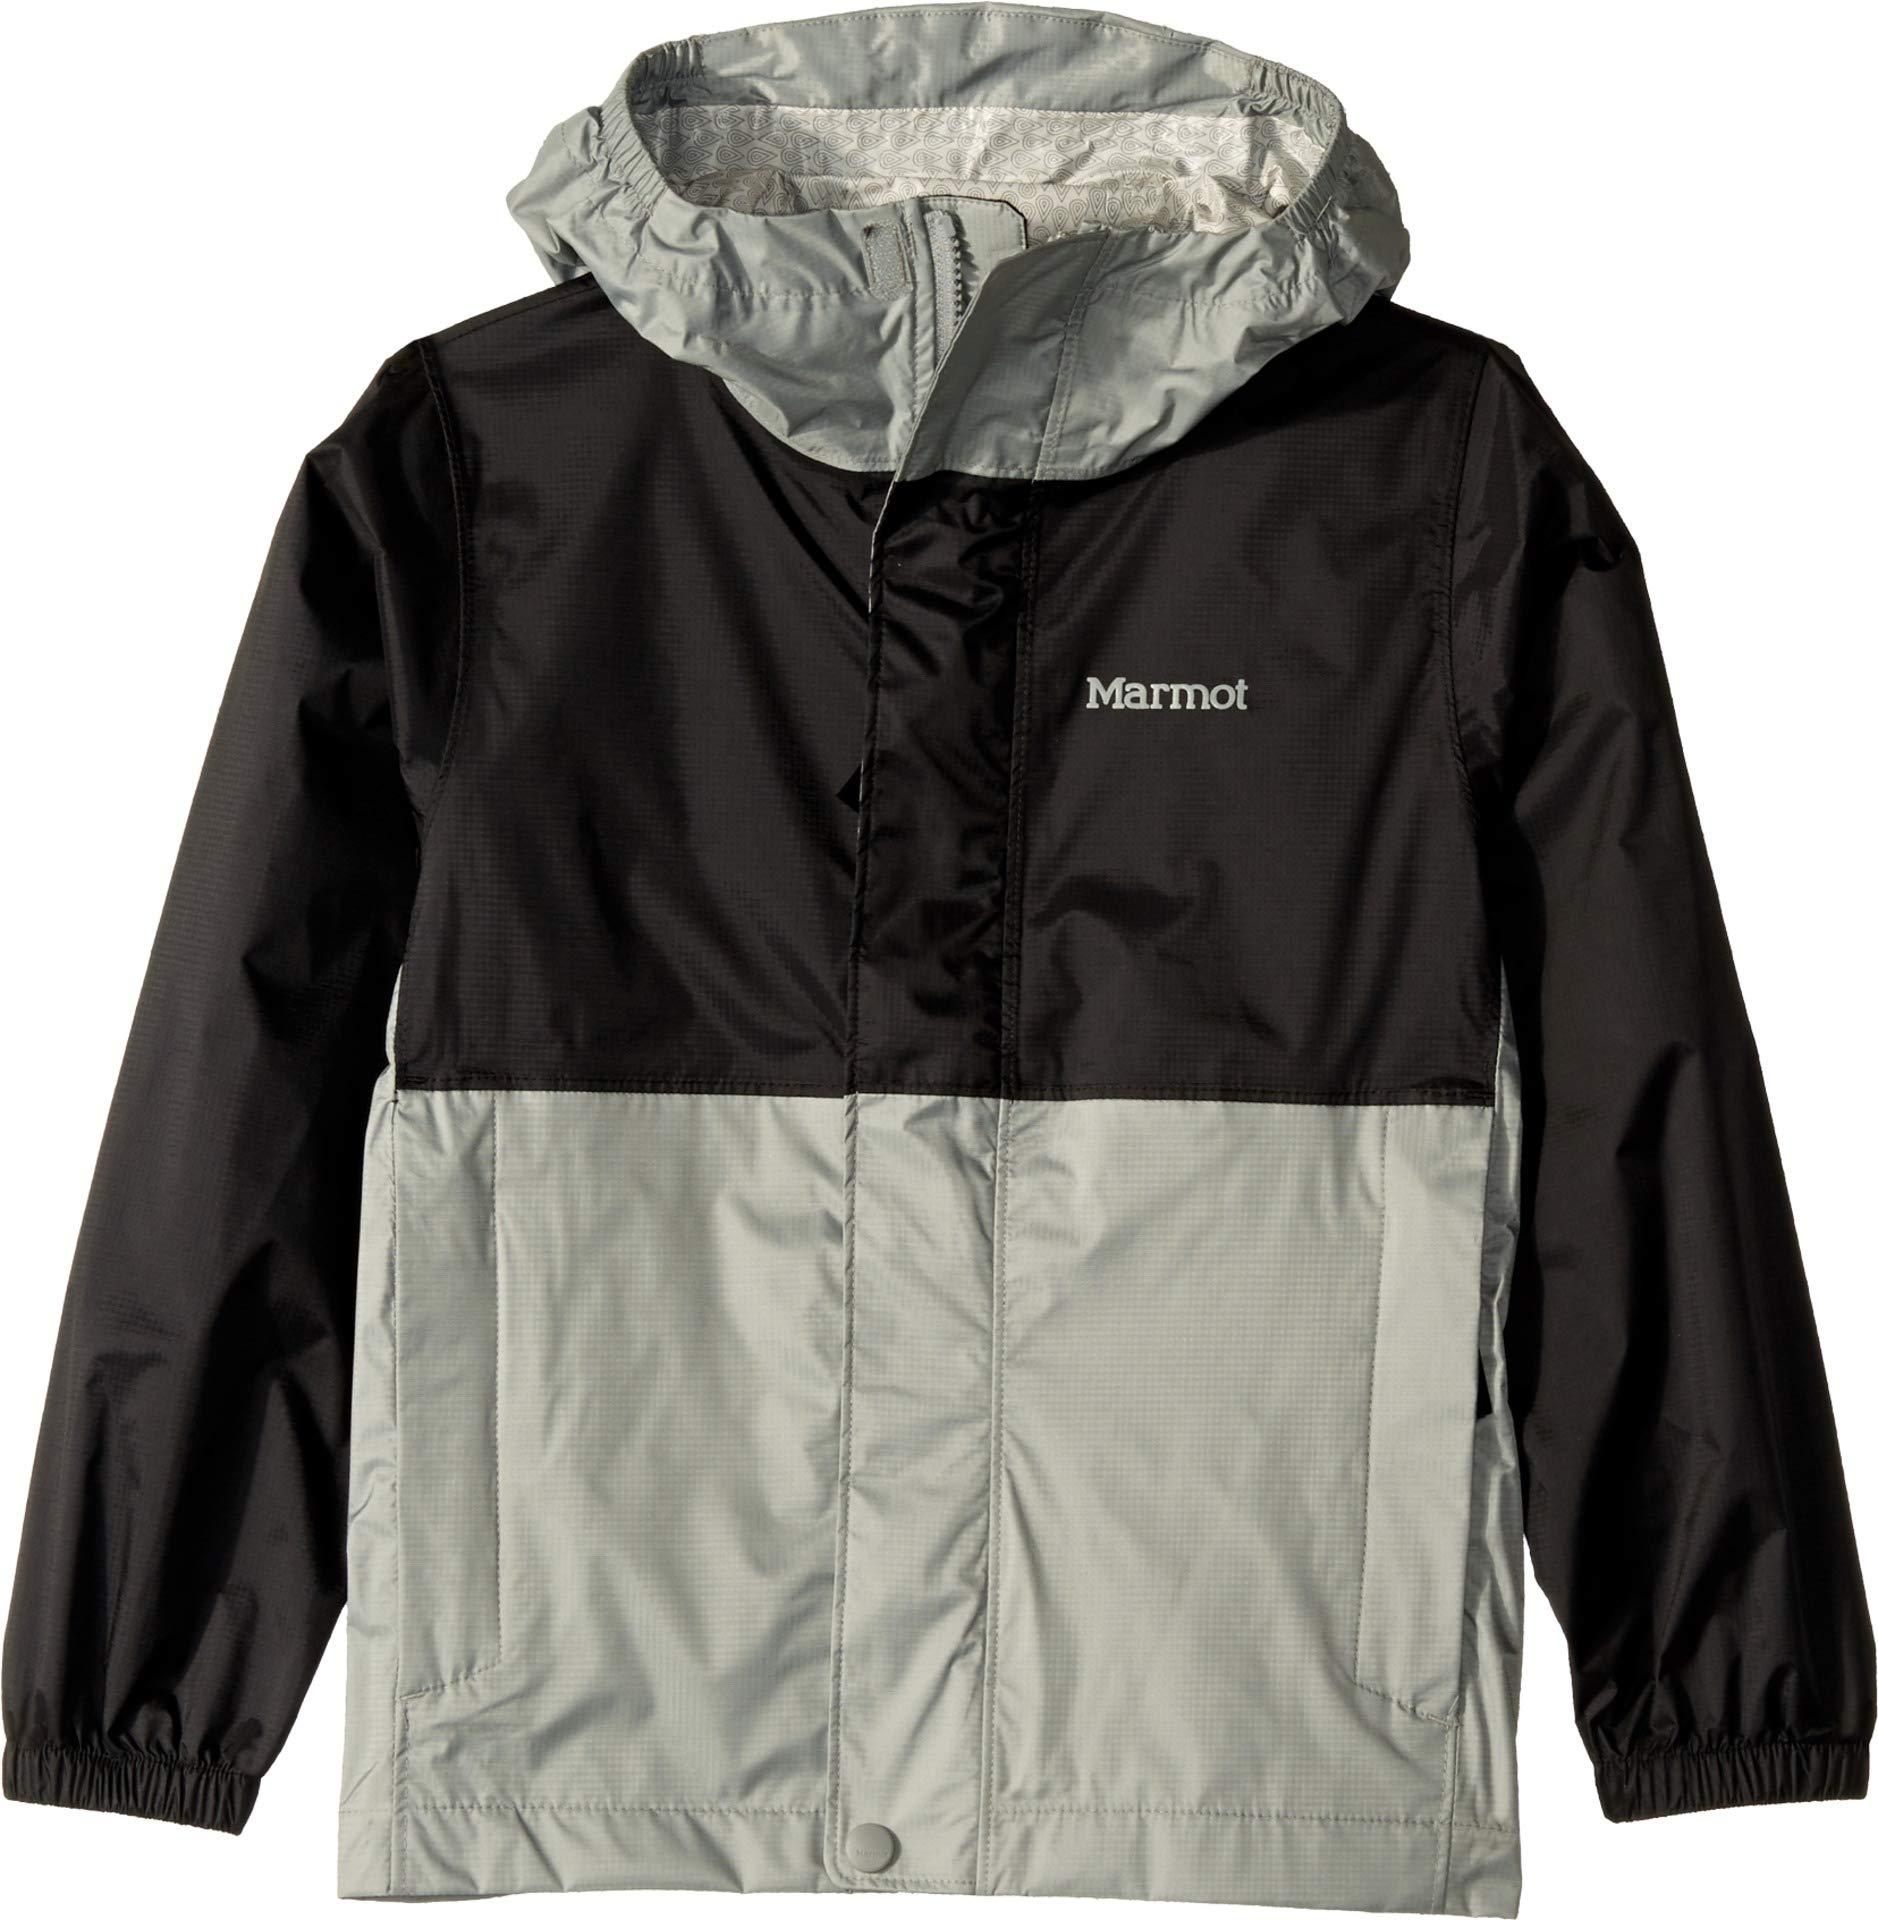 Marmot Kids Boy's PreCip¿ Eco Jacket (Little Kids/Big Kids) Black/Grey Storm Medium